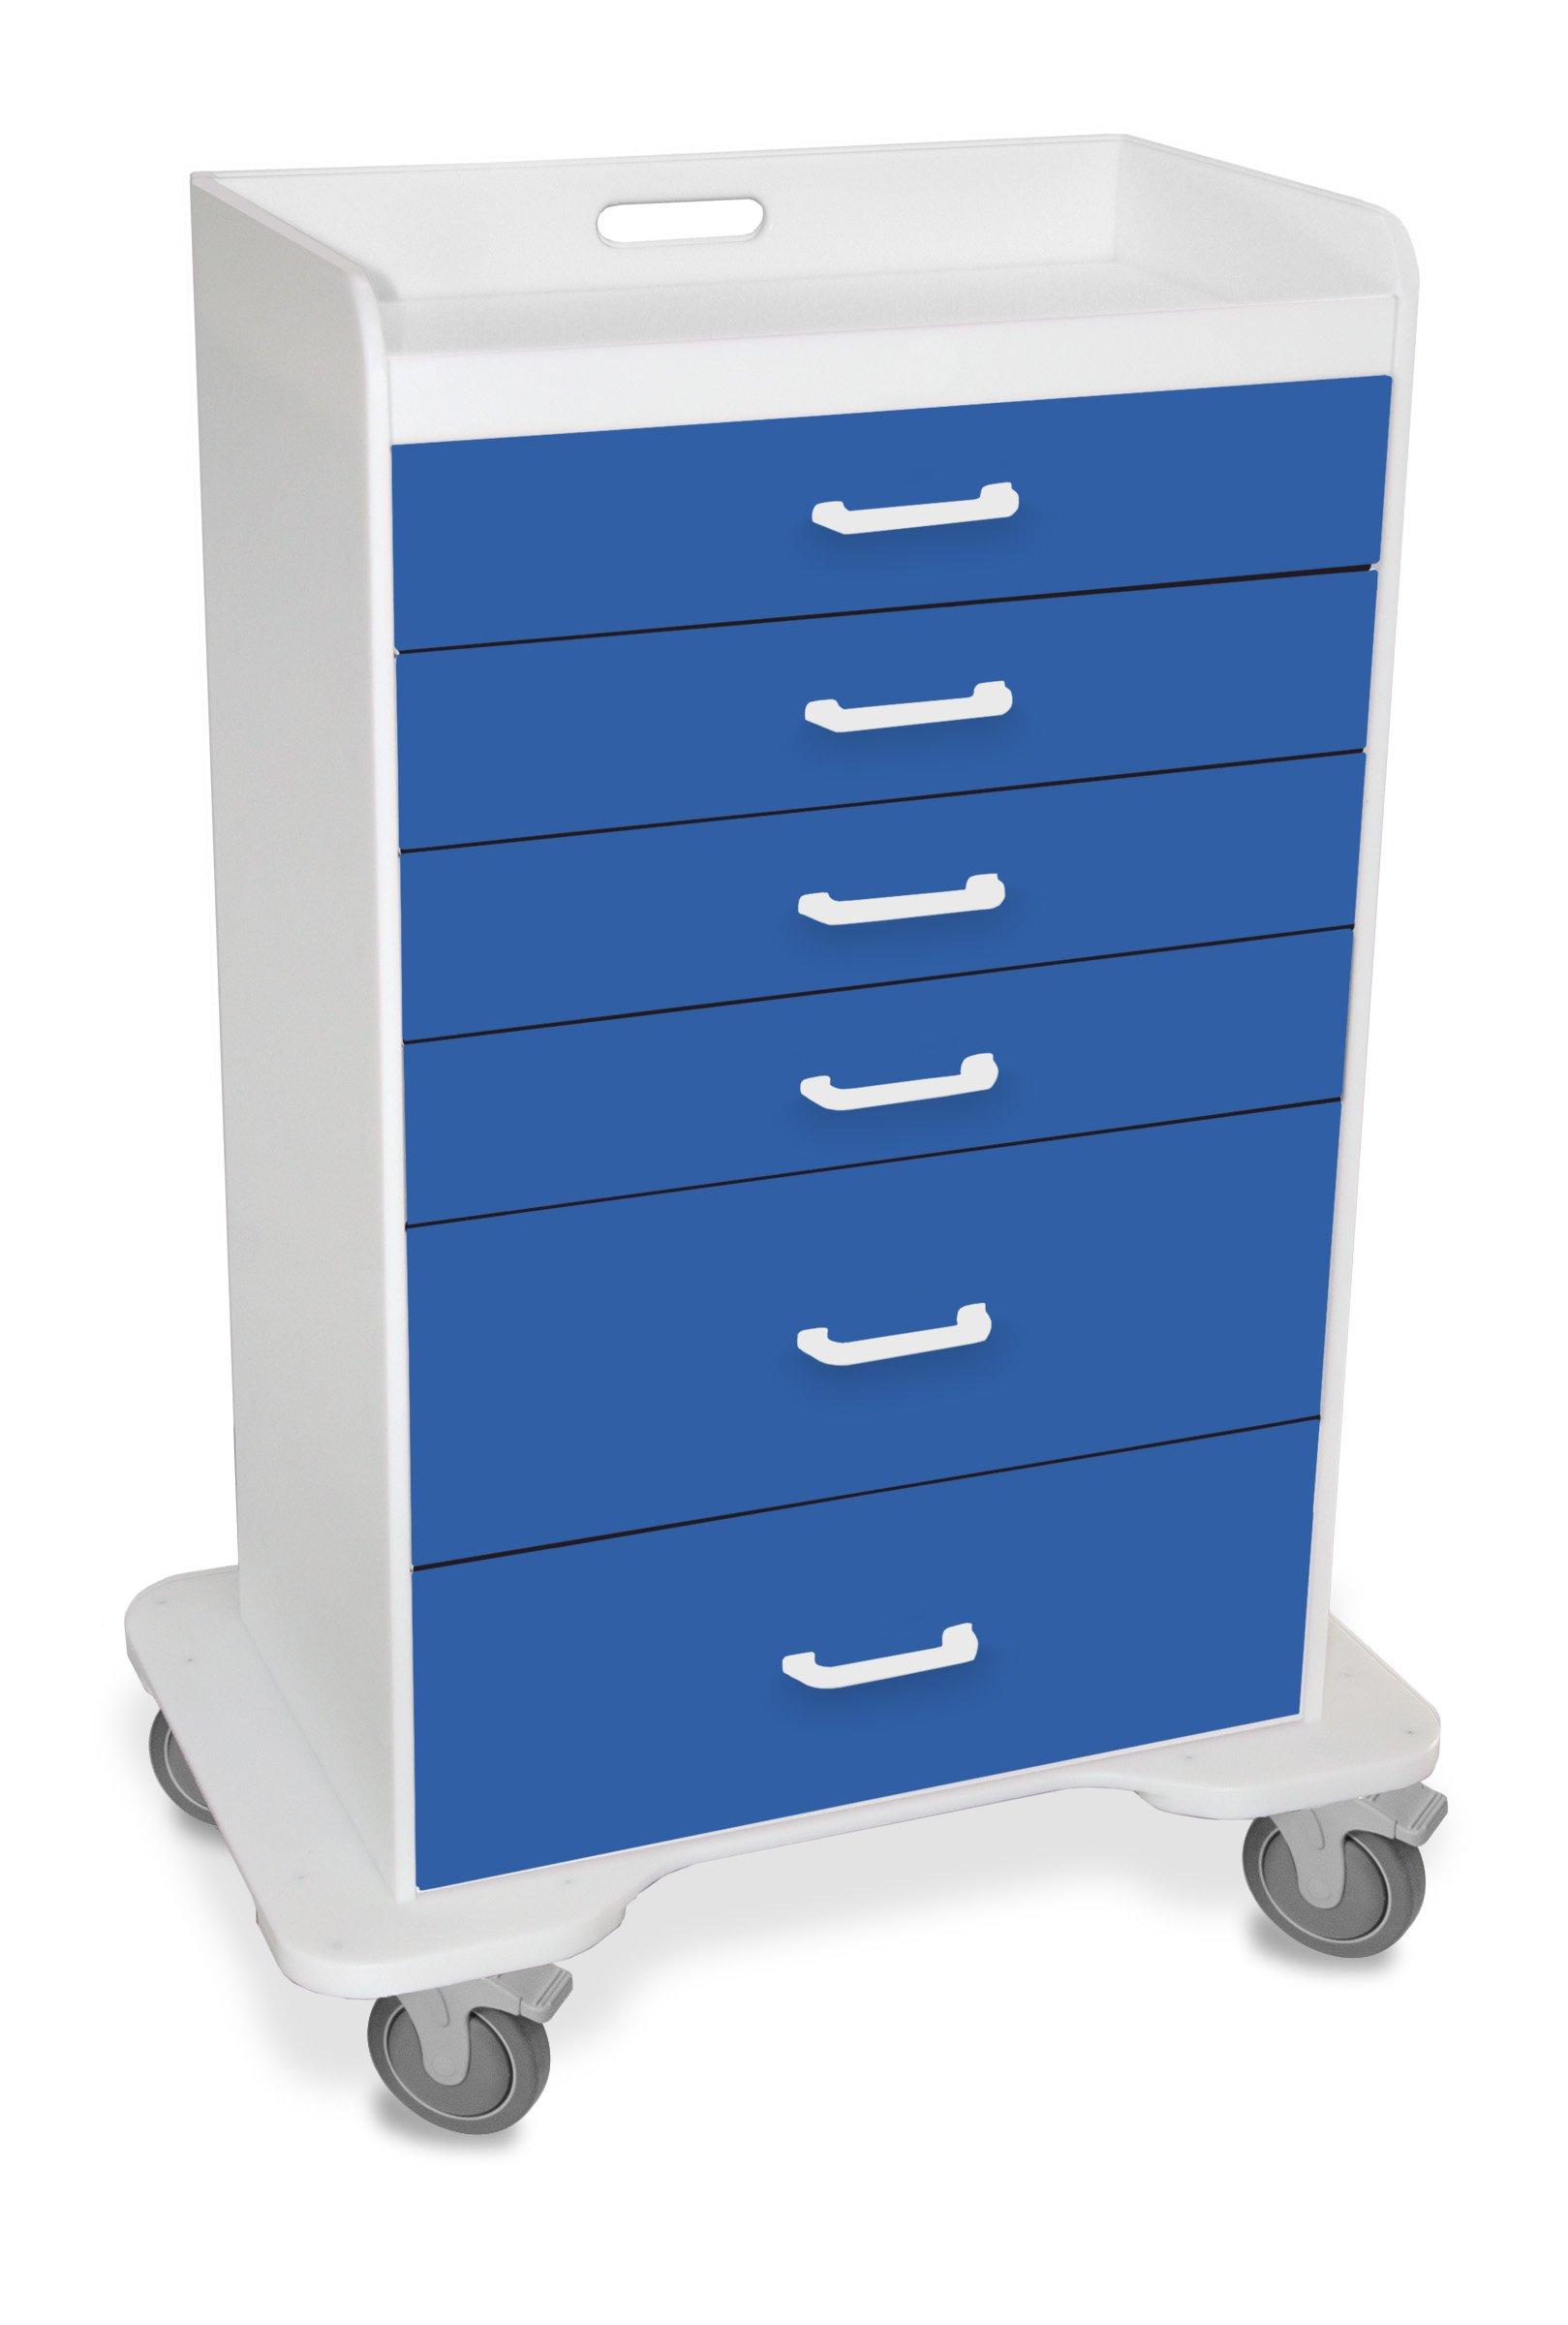 TrippNT 51071 Polyethylene Procedure Cart, Locking, 31'' Width x 48'' Height x 20'' Depth, 6 Drawers, Global Blue by TrippNT